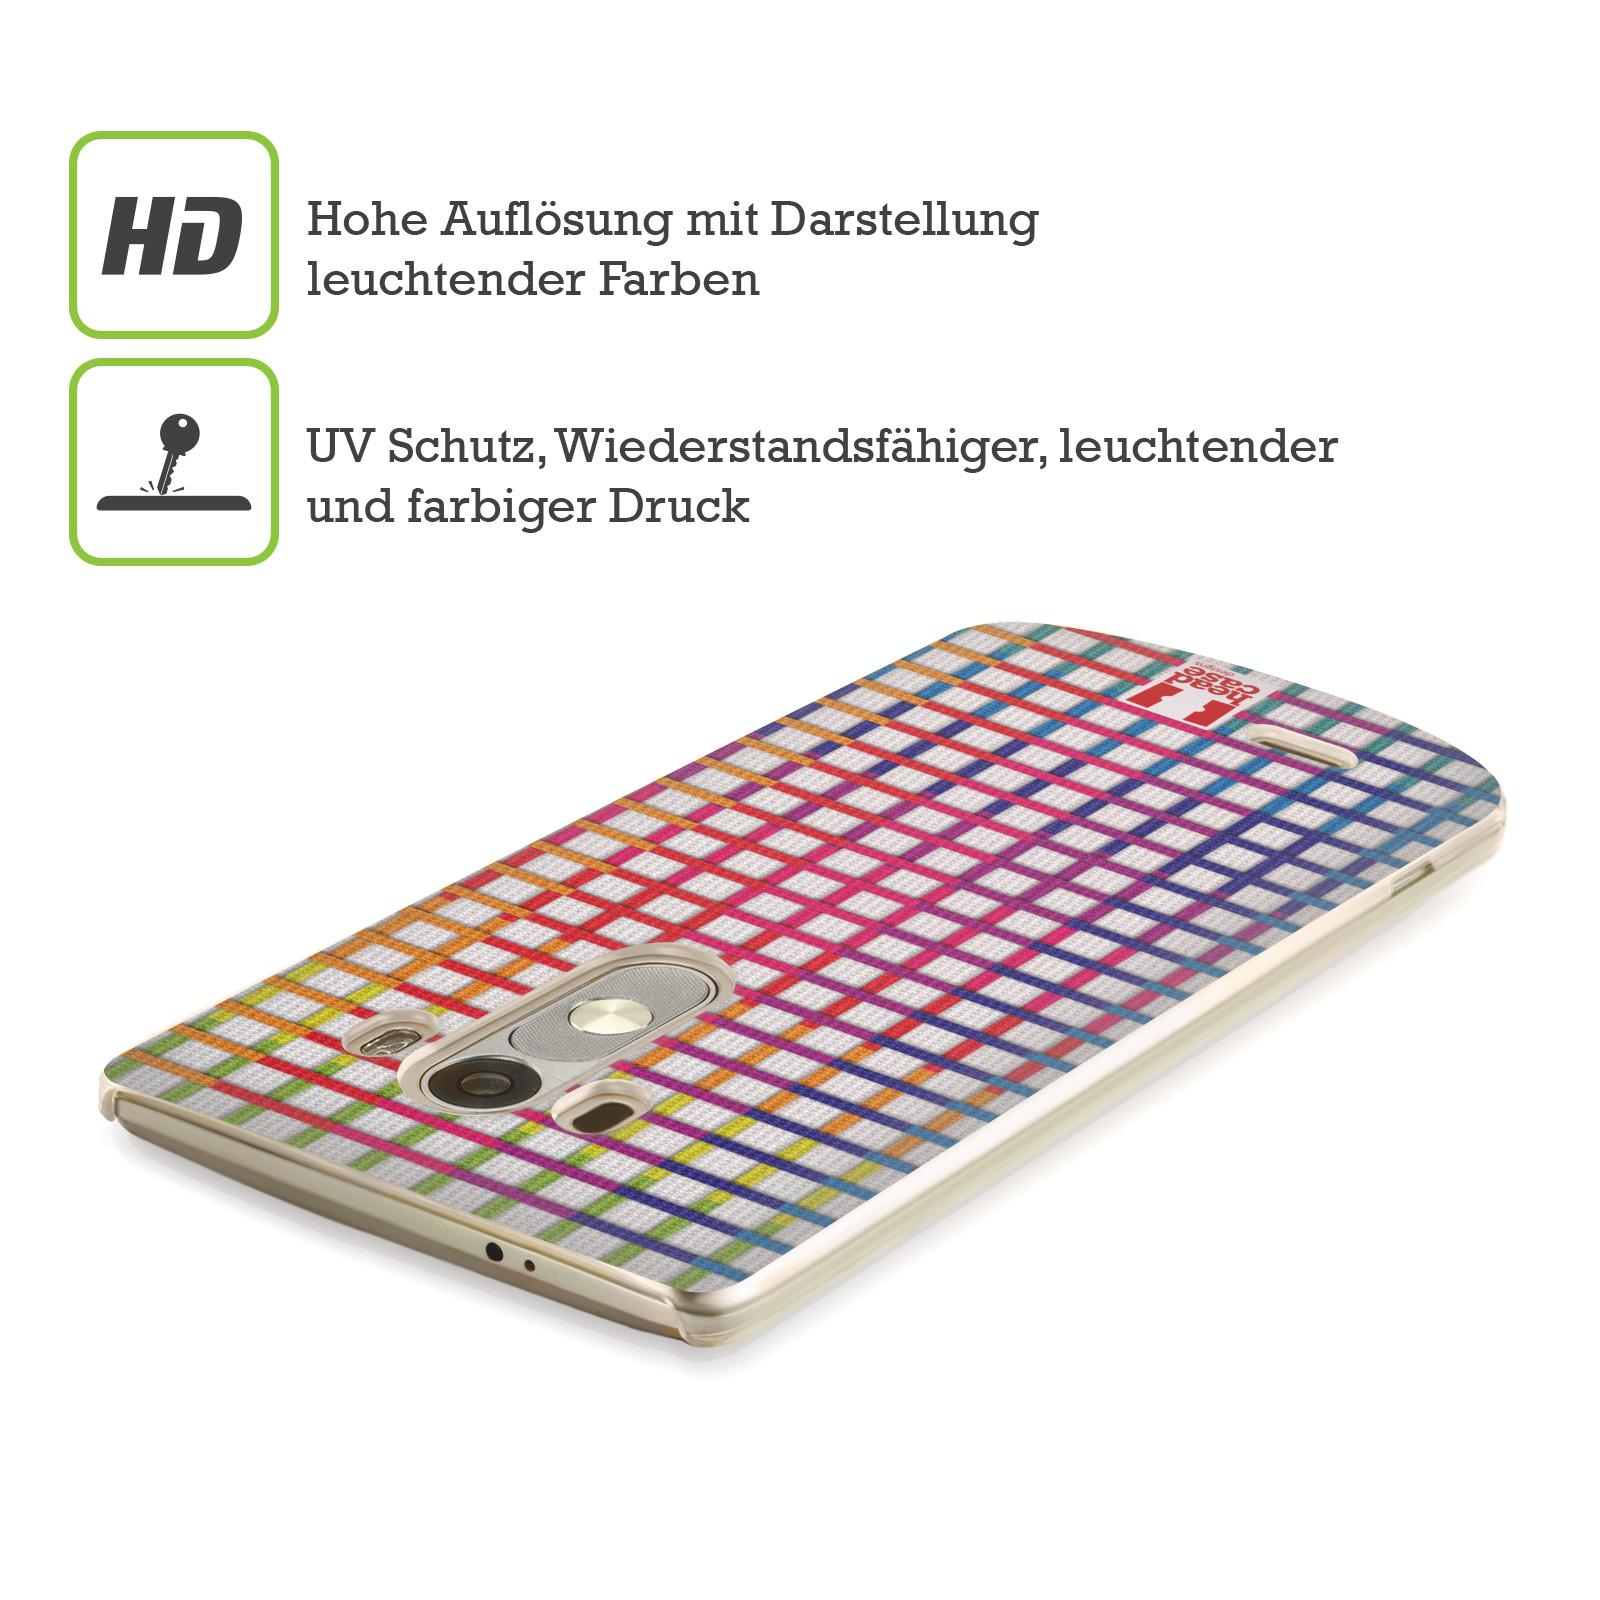 HEAD-CASE-DESIGNS-STOFF-FASHION-RUCKSEITE-HULLE-FUR-LG-HANDYS-2